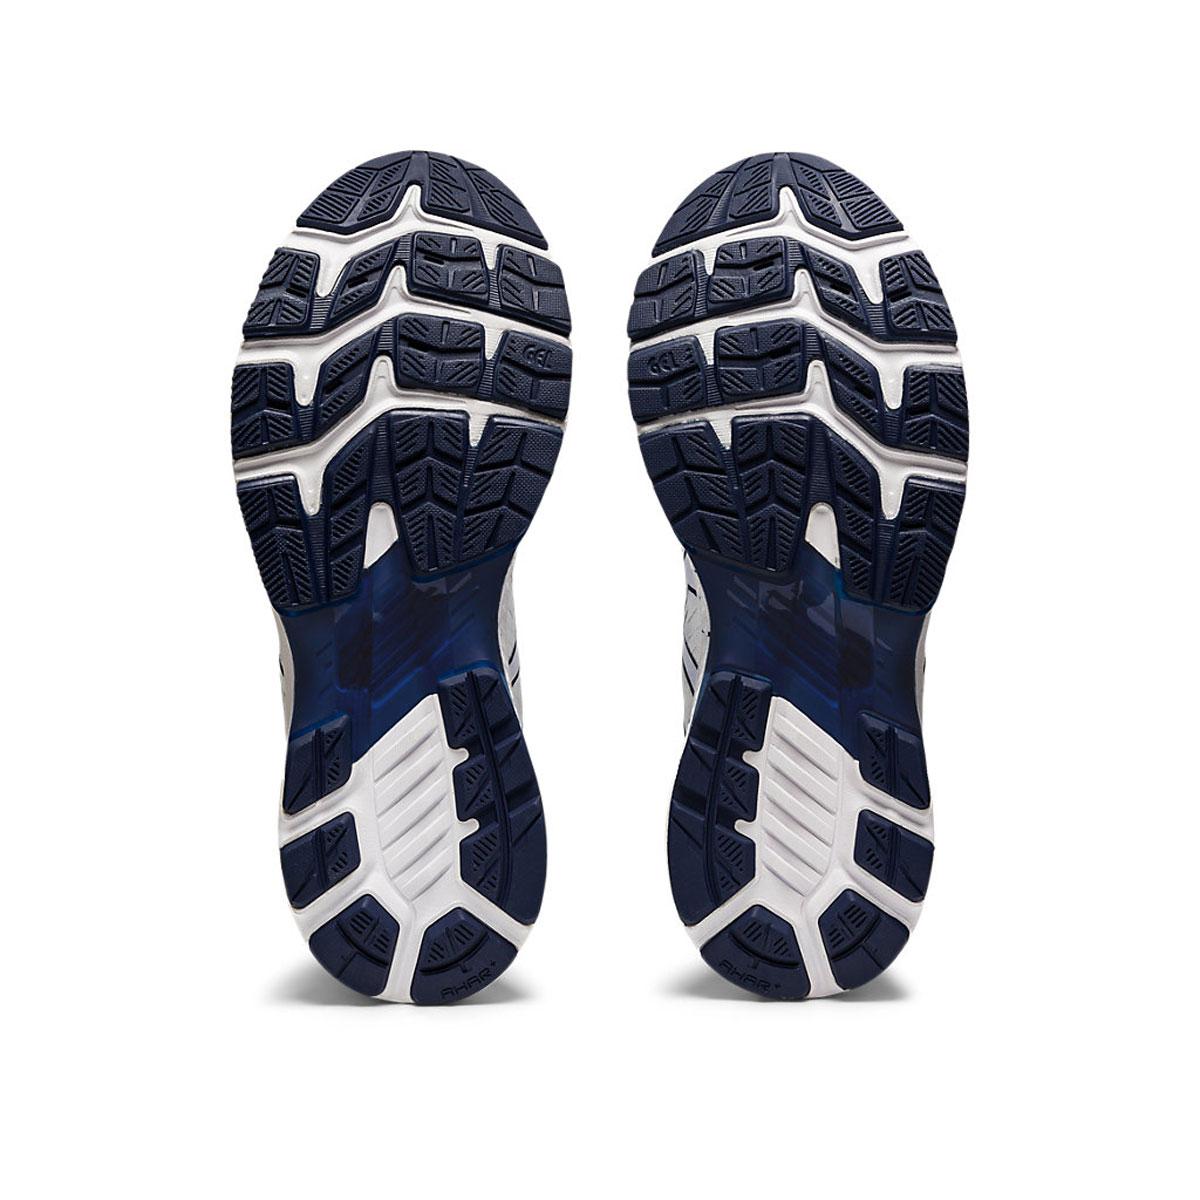 Men's Asics GEL-Kayano 27 Running Shoe - Color: White/Peacoat (Regular Width) - Size: 6, White/Peacoat, large, image 7